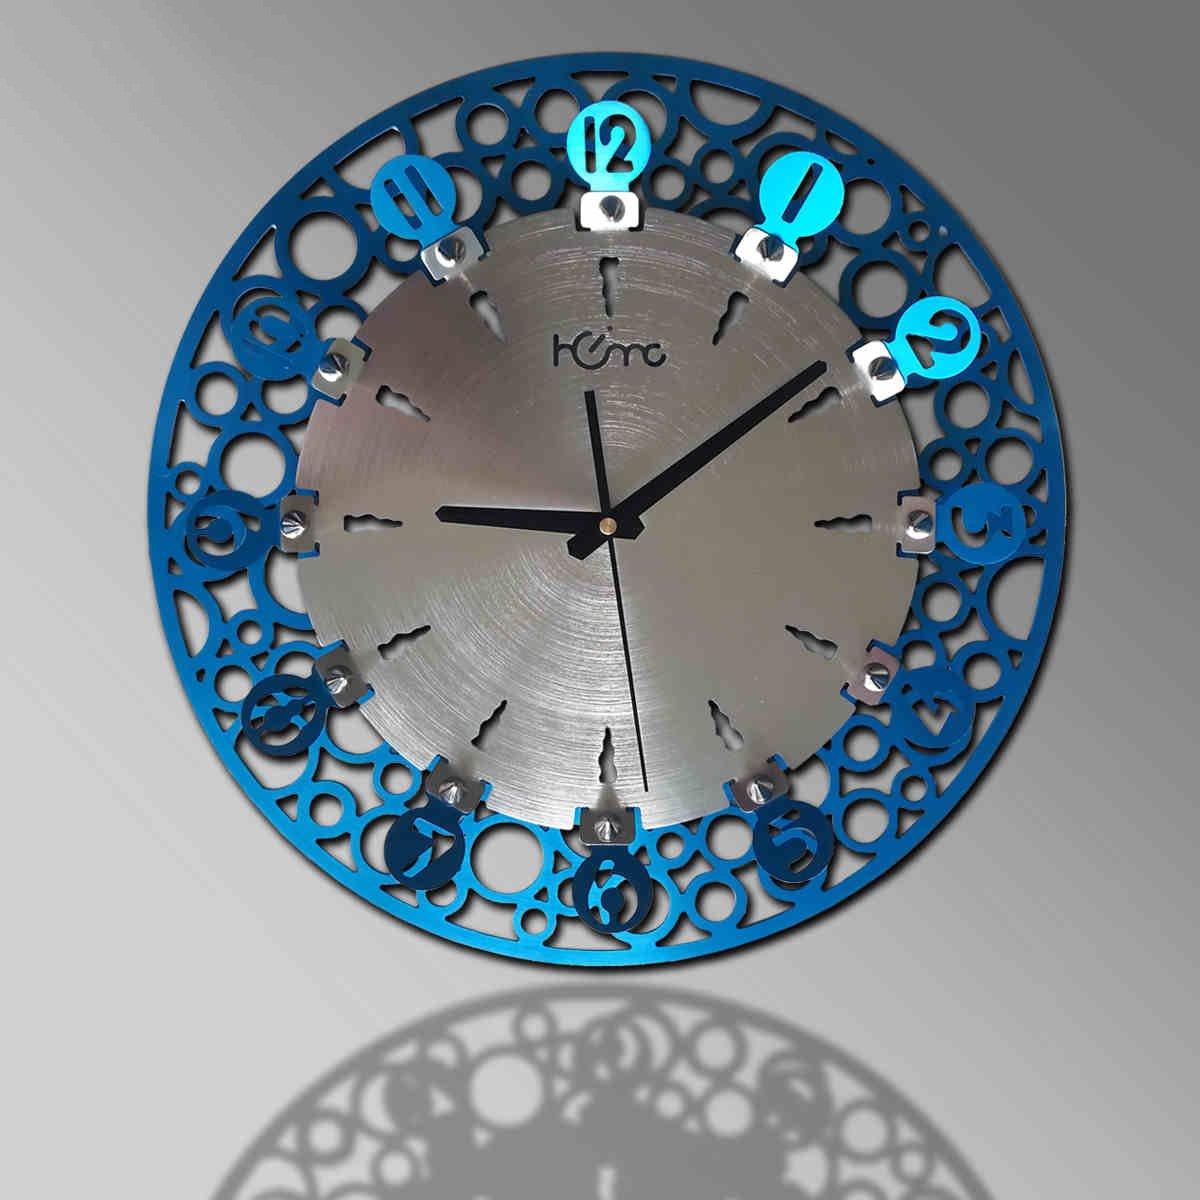 GRJH® メタルクリエイティブリビングルームウォールクロックファッションクリエイティブヨーロッパスタイルのモダンなパーソナリティミュートクォーツ時計 クリエイティブファッションシンプル B07CNLH5L5